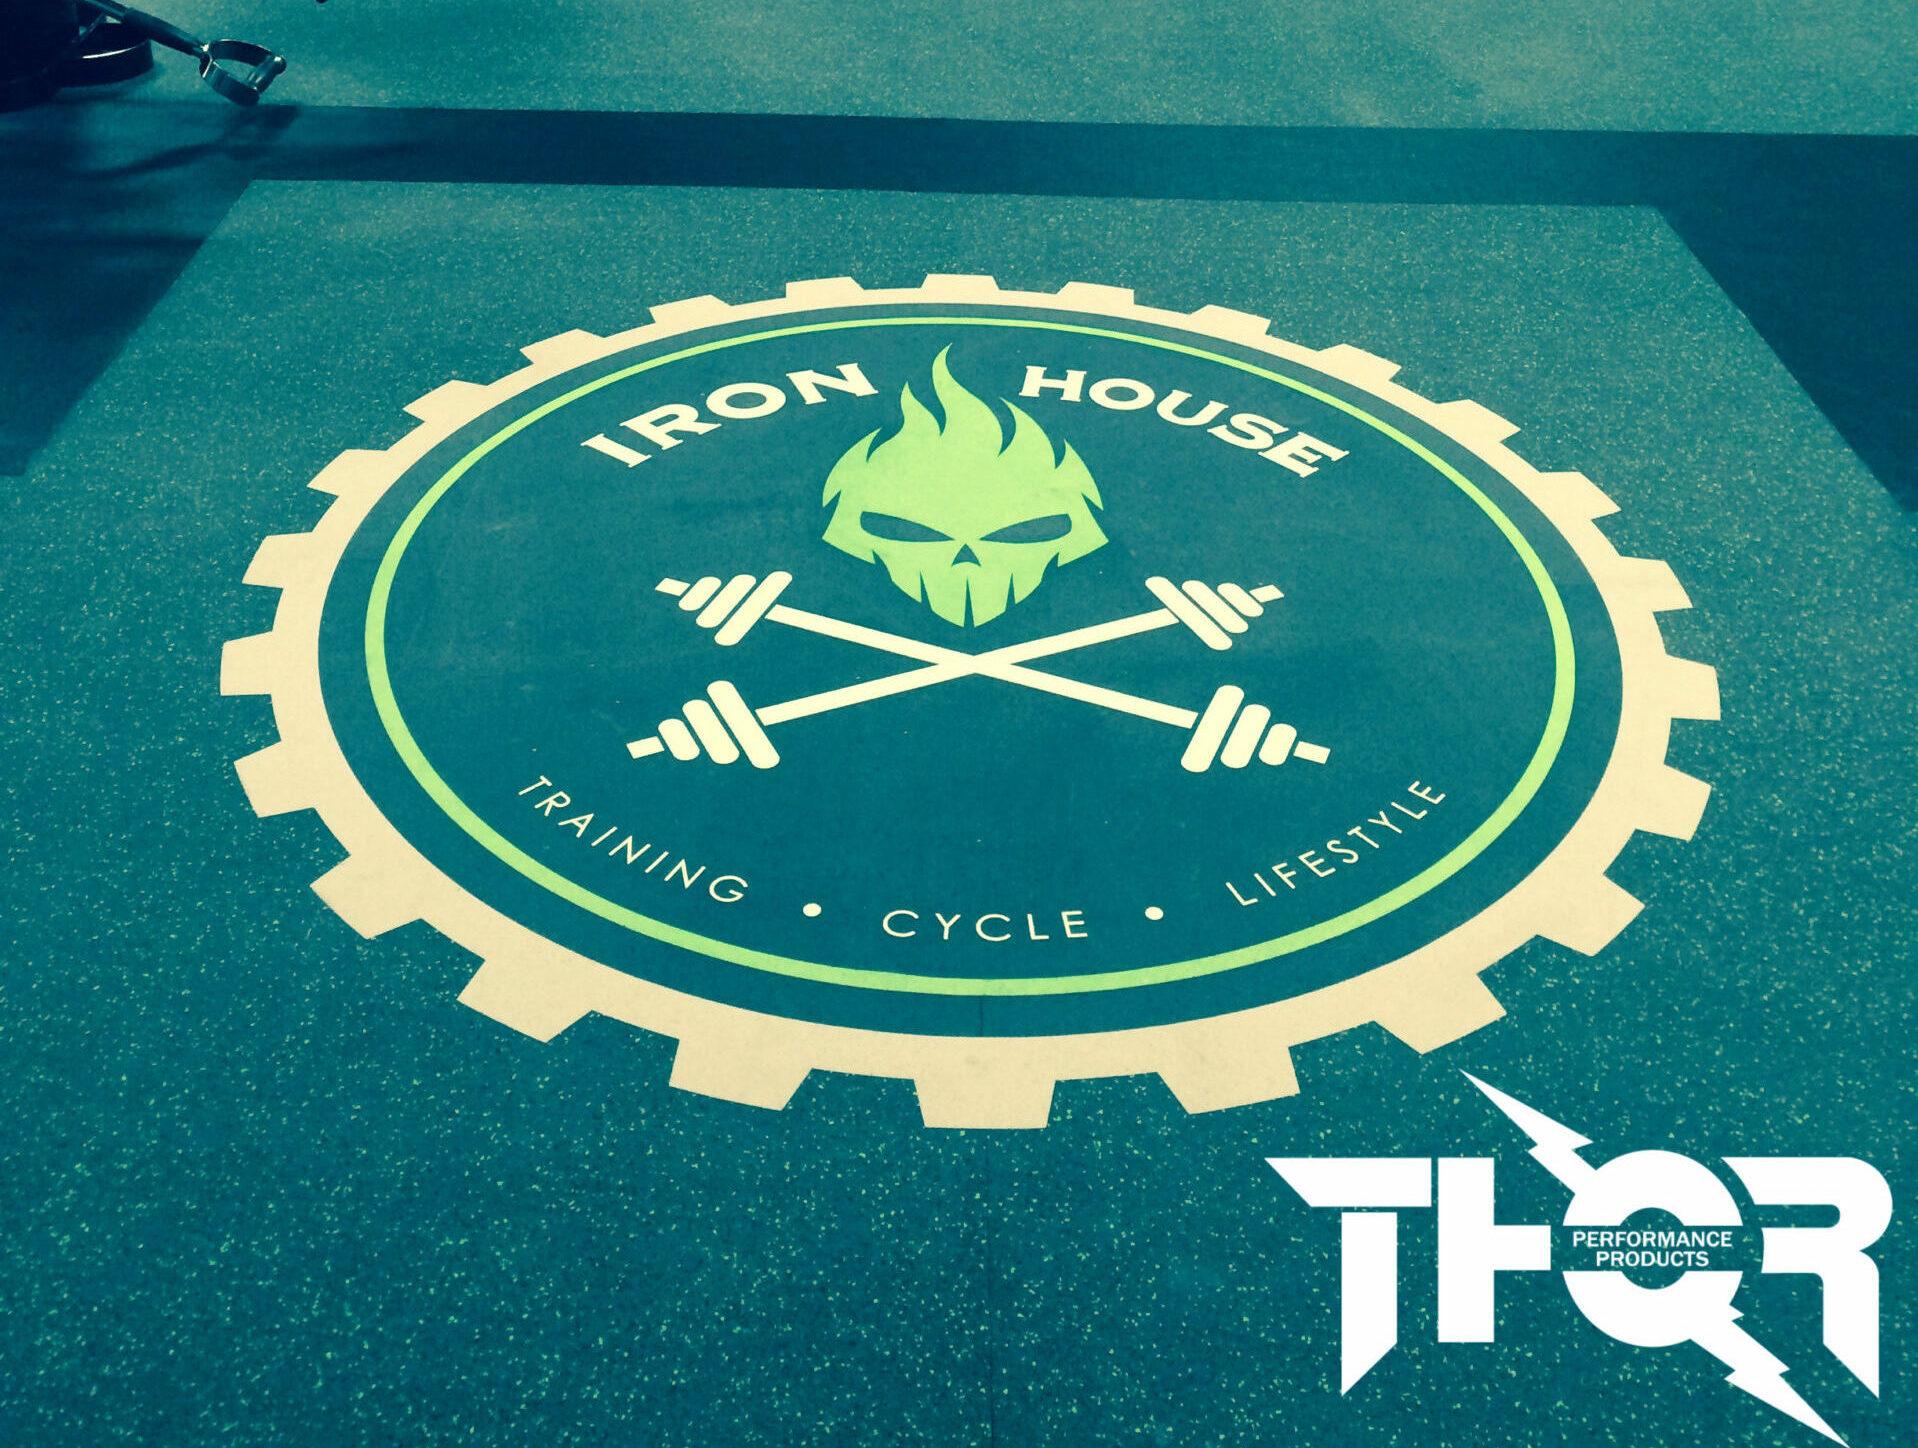 Iron-House-Fitness-scaled-e1575653361597